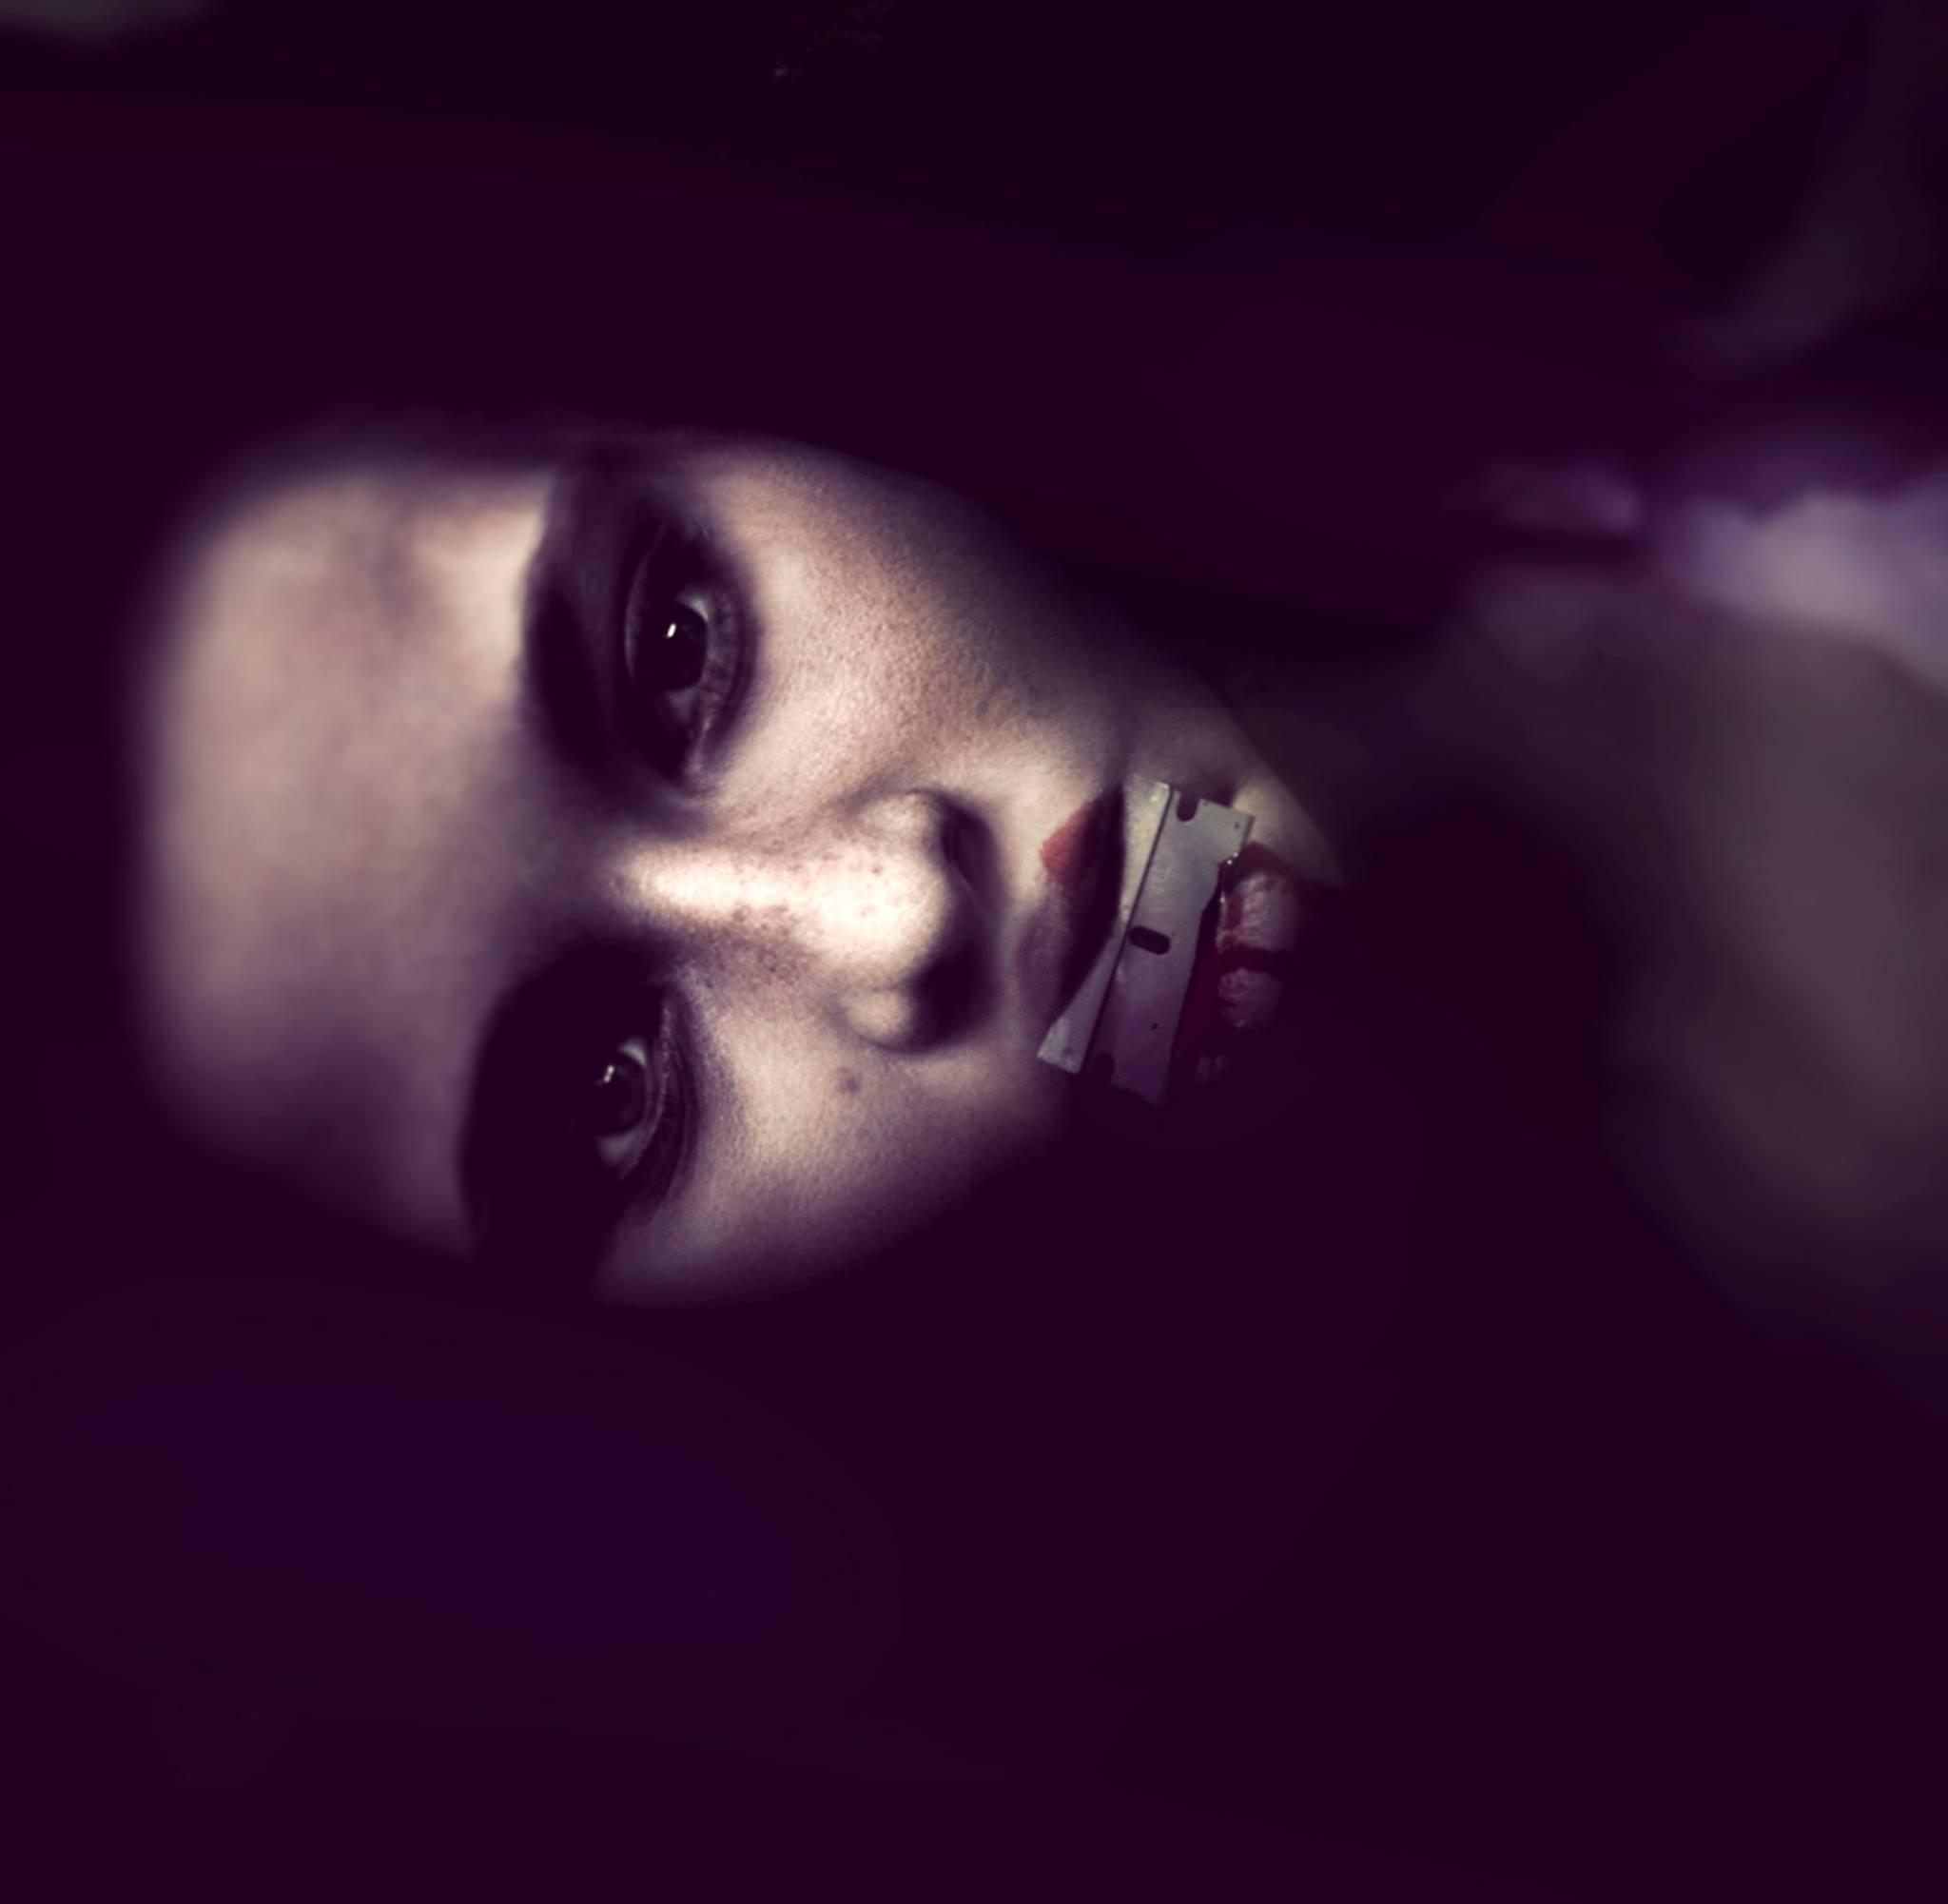 Jenn Violetta – photography macabre1